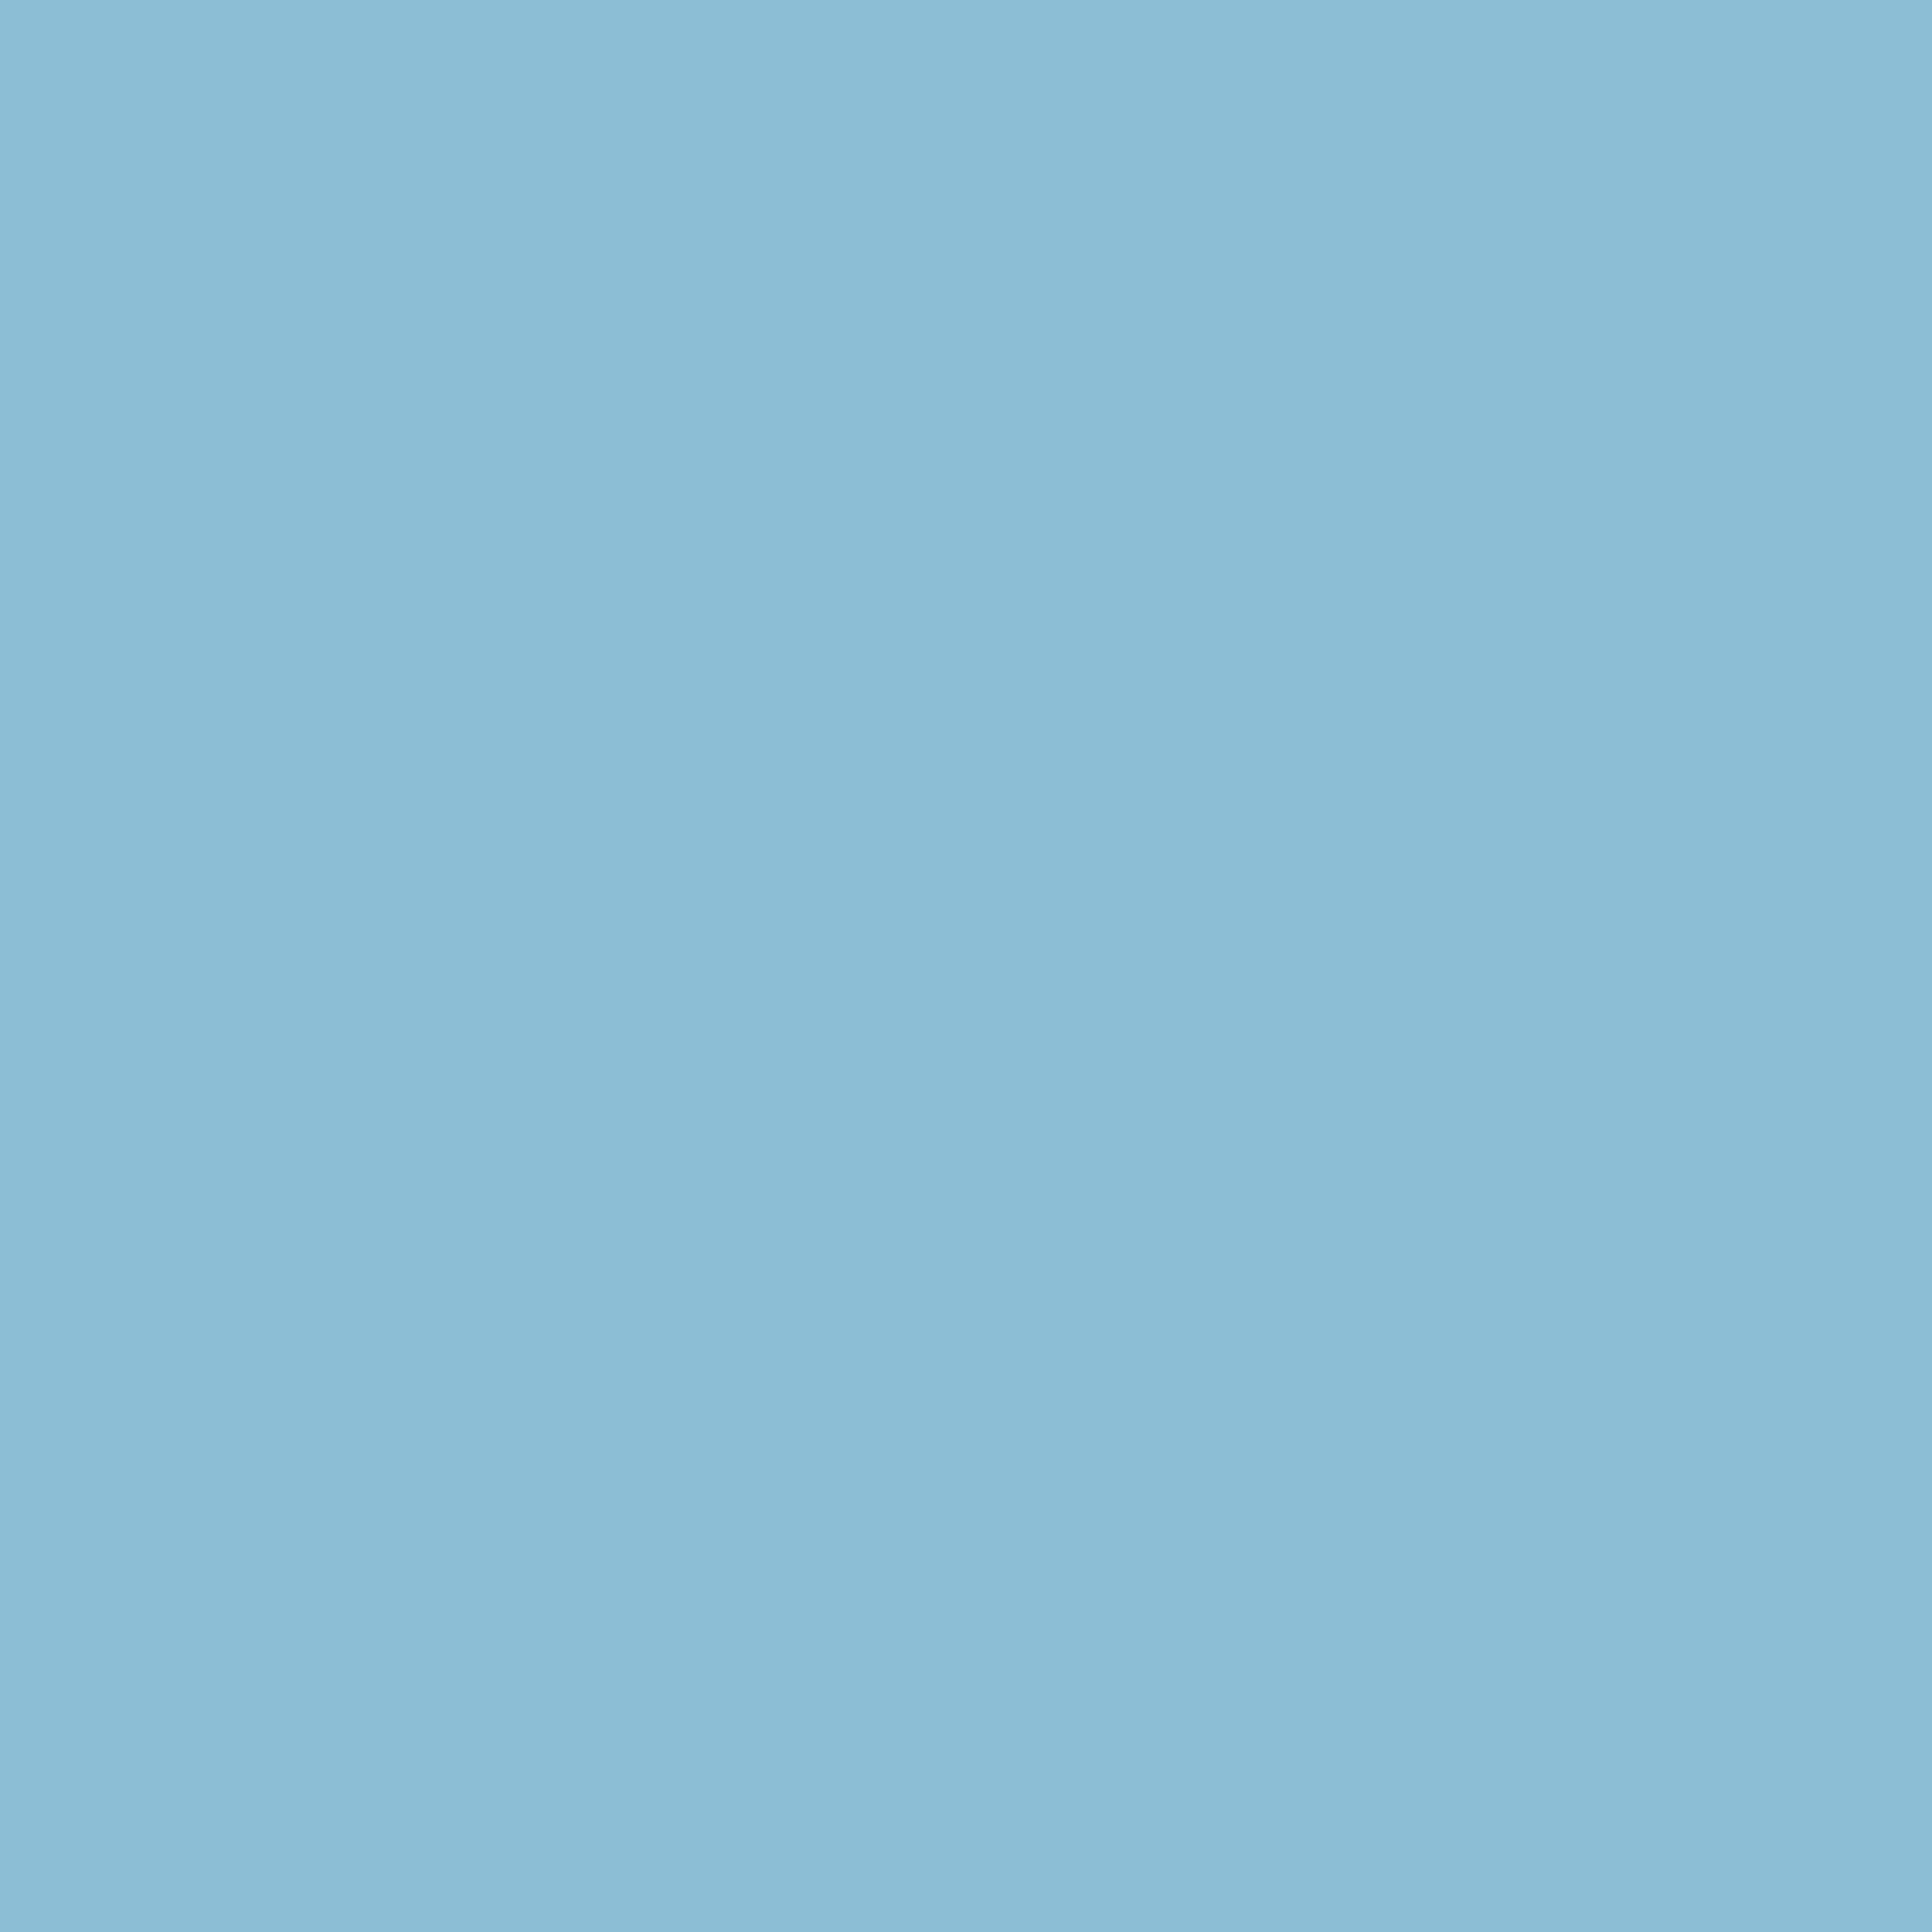 2048x2048 Dark Sky Blue Solid Color Background